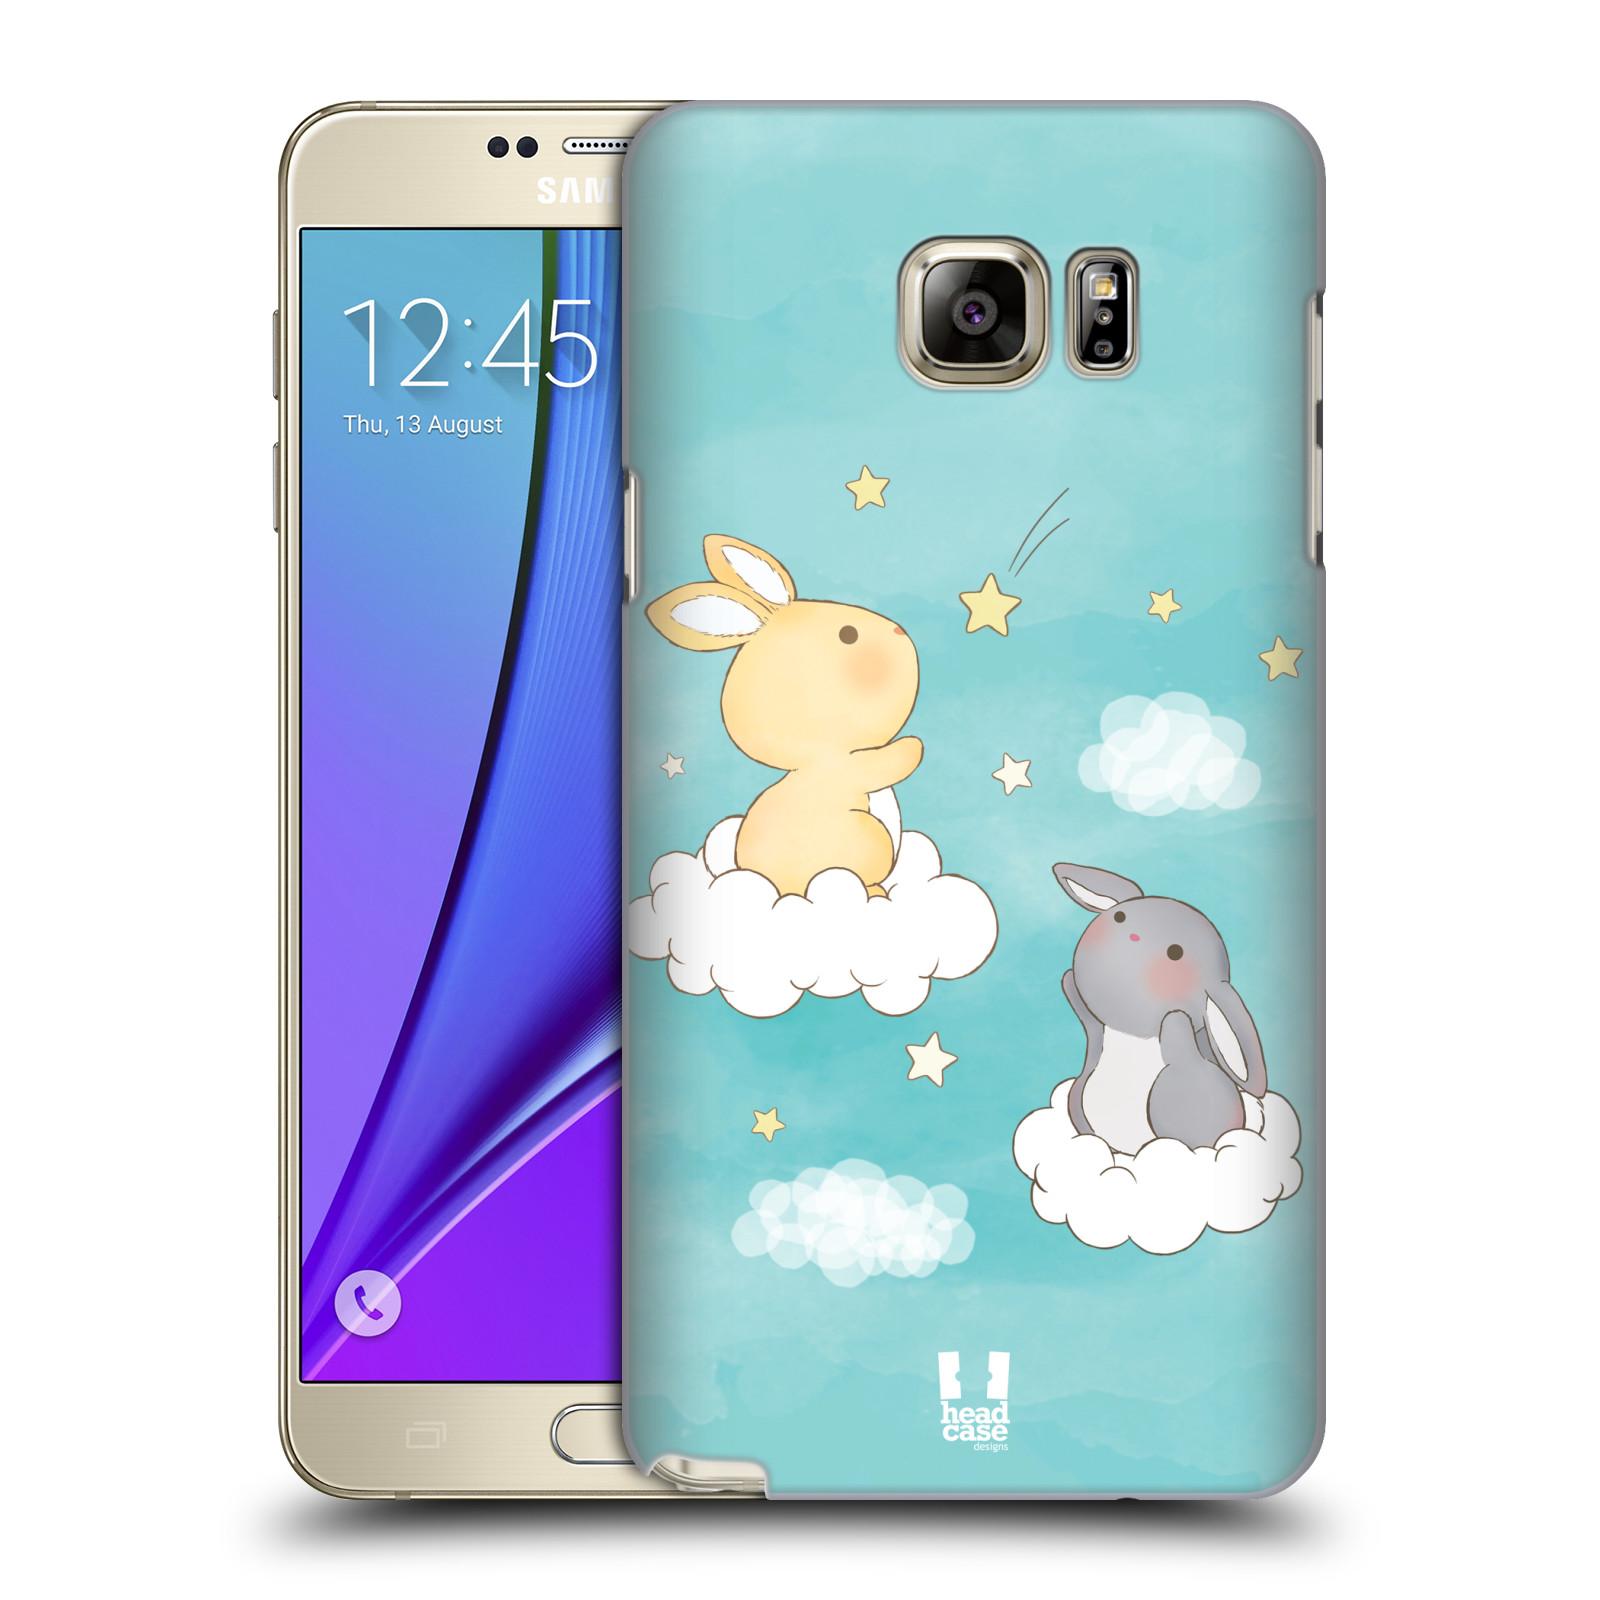 HEAD CASE plastový obal na mobil SAMSUNG Galaxy Note 5 (N920) vzor králíček a hvězdy modrá